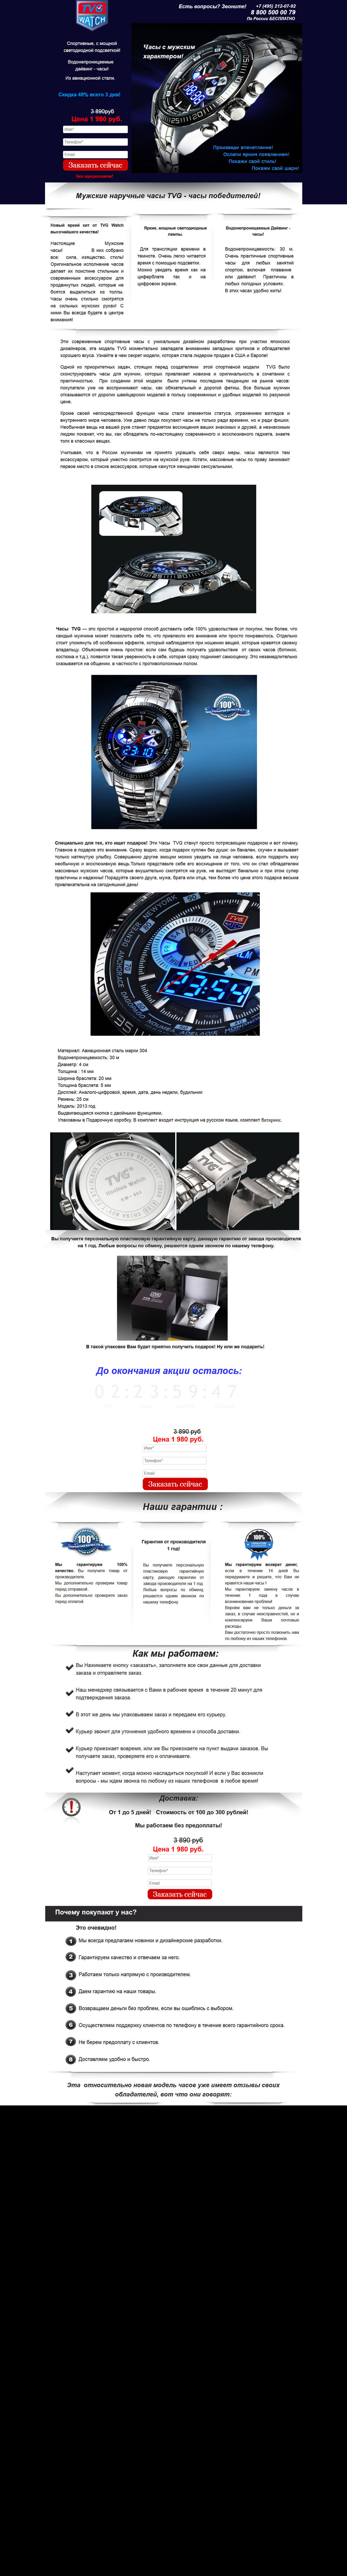 Шаблон лендинга: Мужские наручные часы TVG